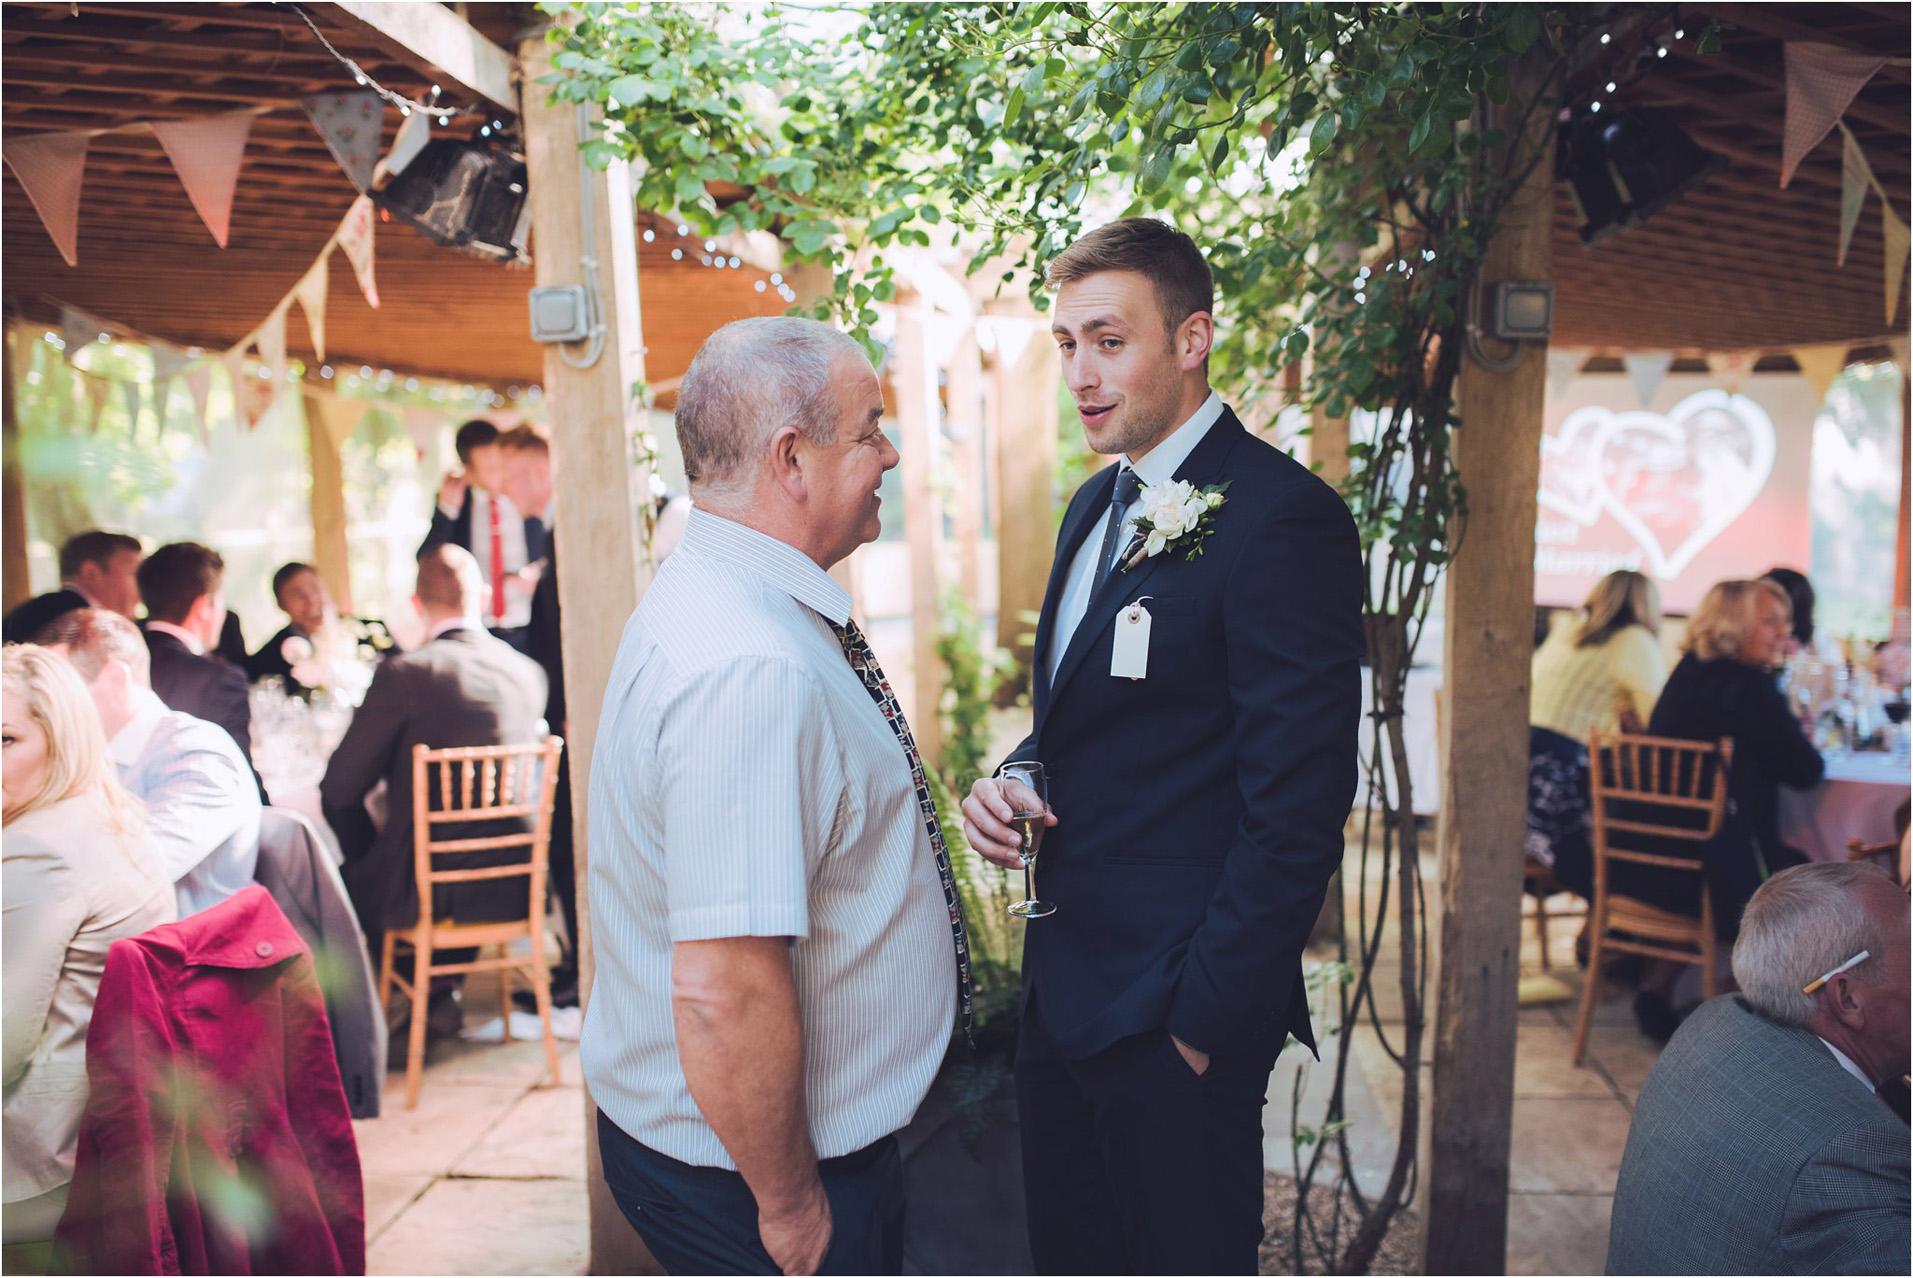 Simon biffen wedding photography 0121